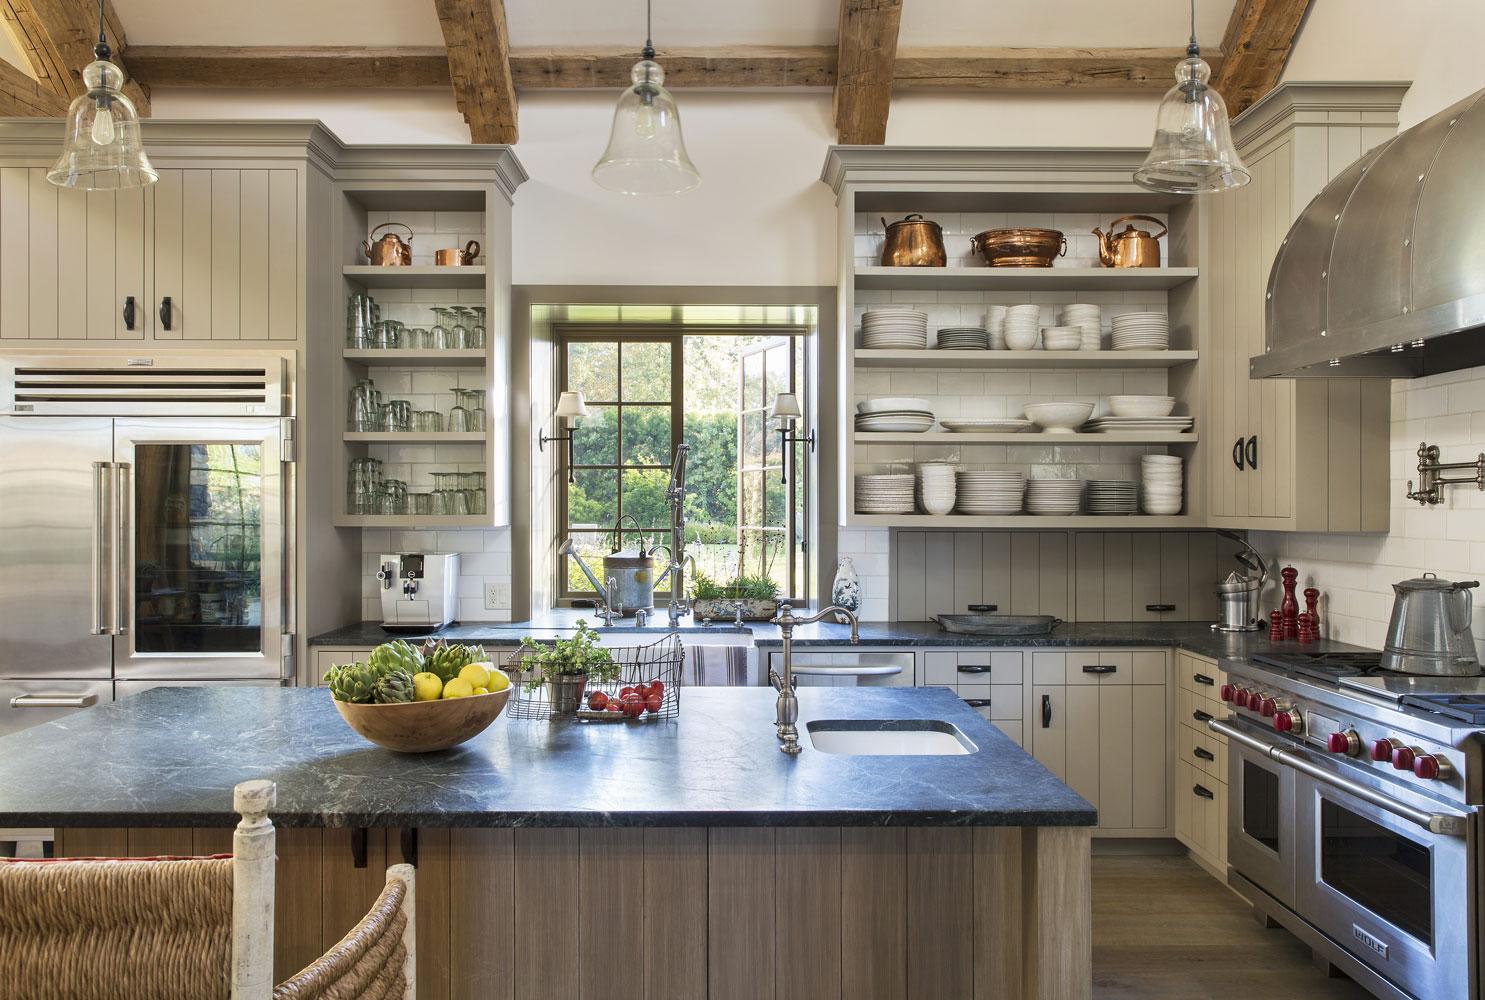 Rustic-Farmhouse-Kitchen-Open-Shelving-Premier-General-Contractors.jpg